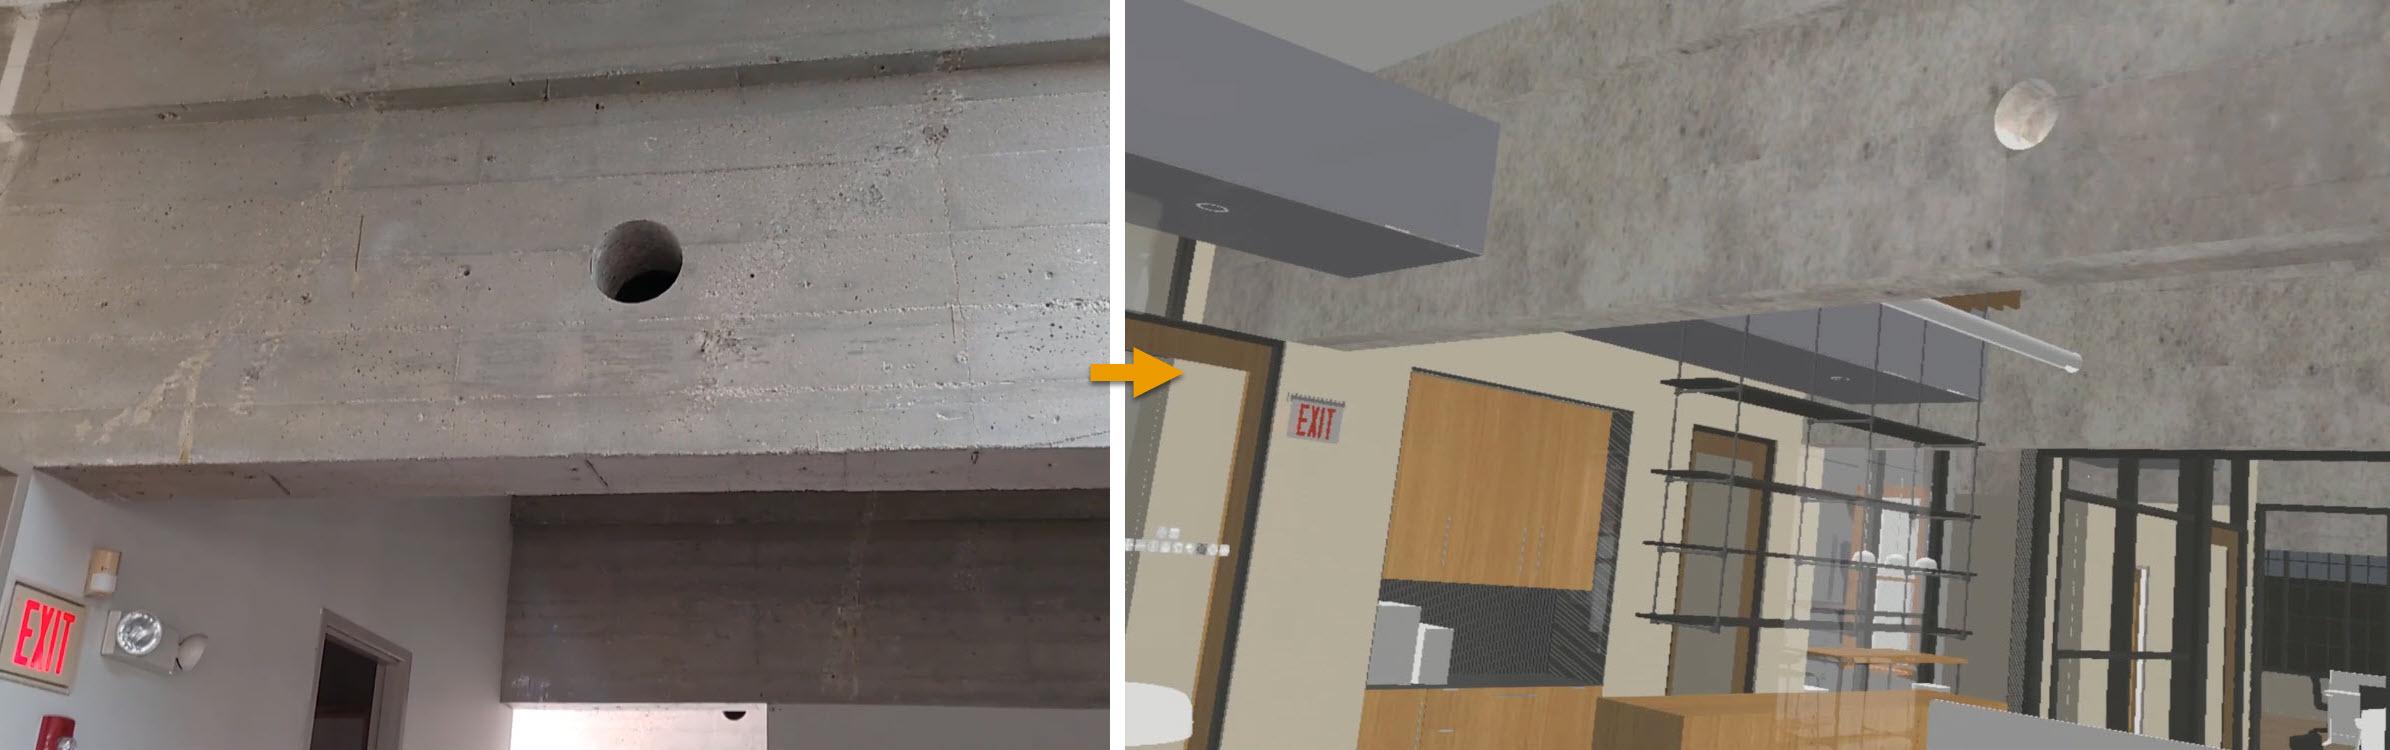 Comparing views, existing concrete beam example